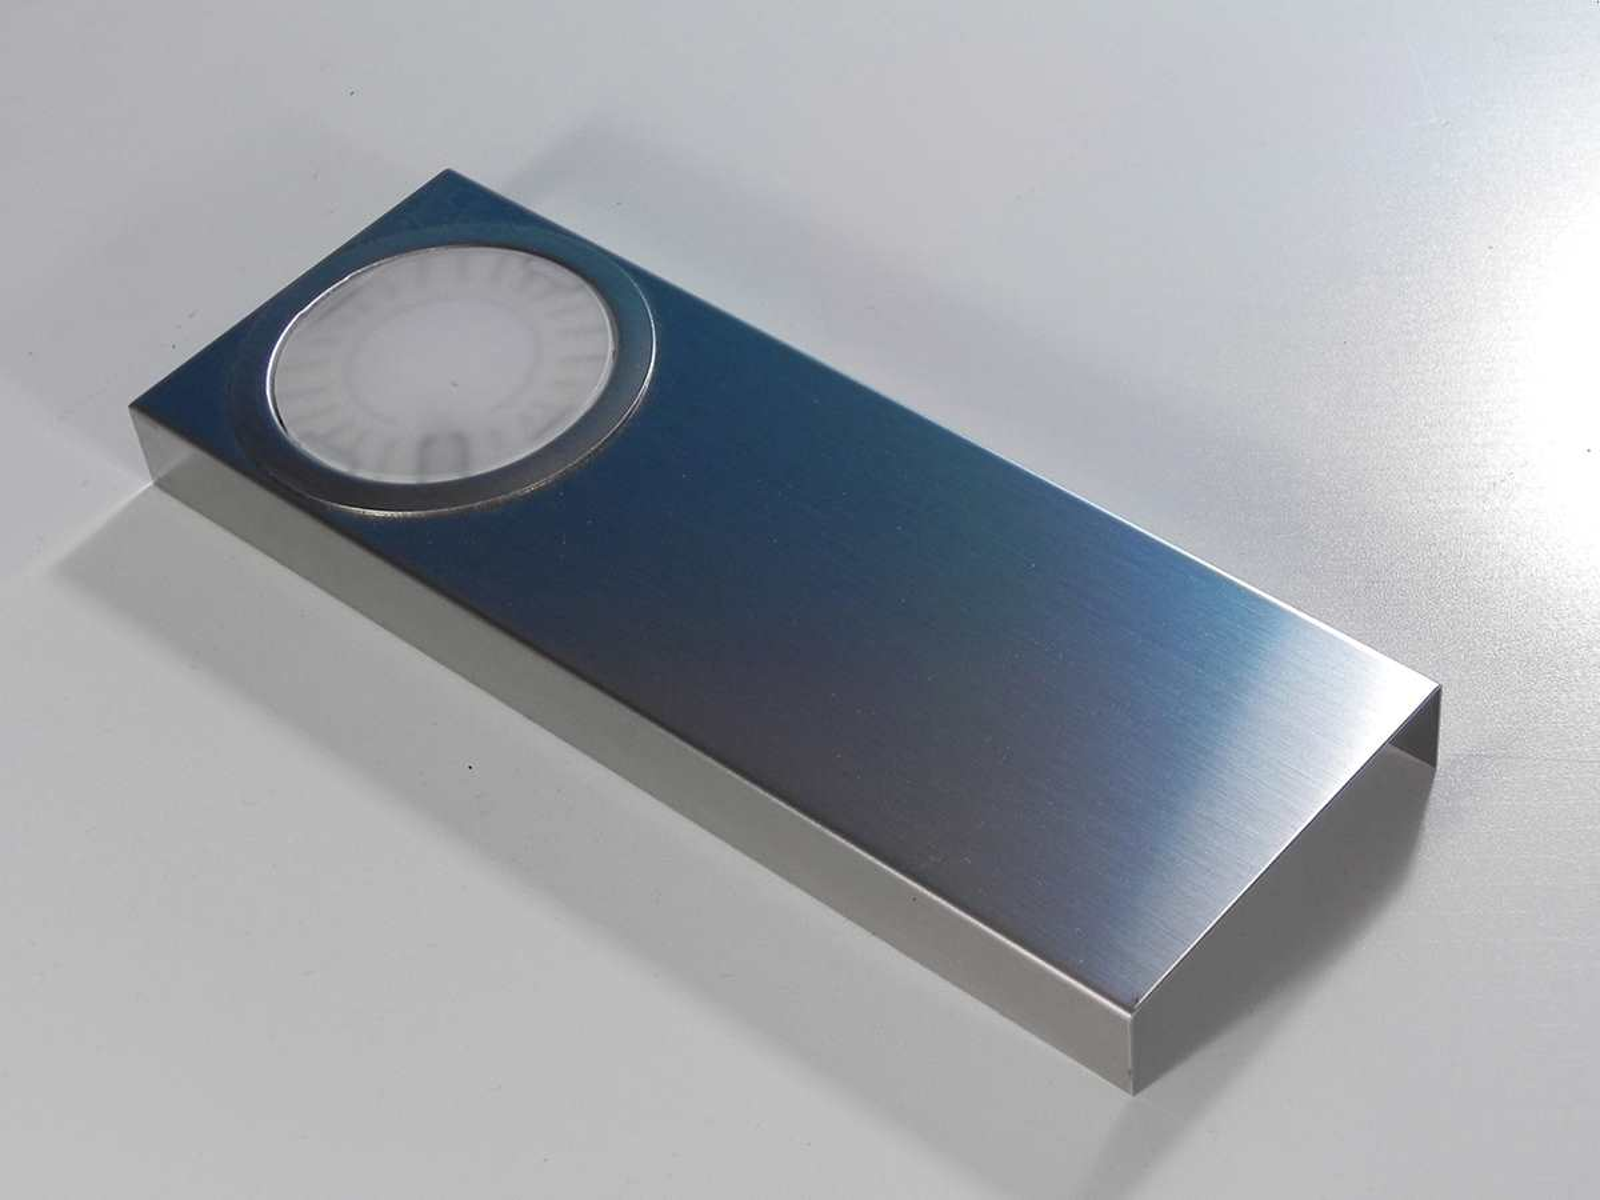 forma e funzione led lichtbox 173k714a edelstahl